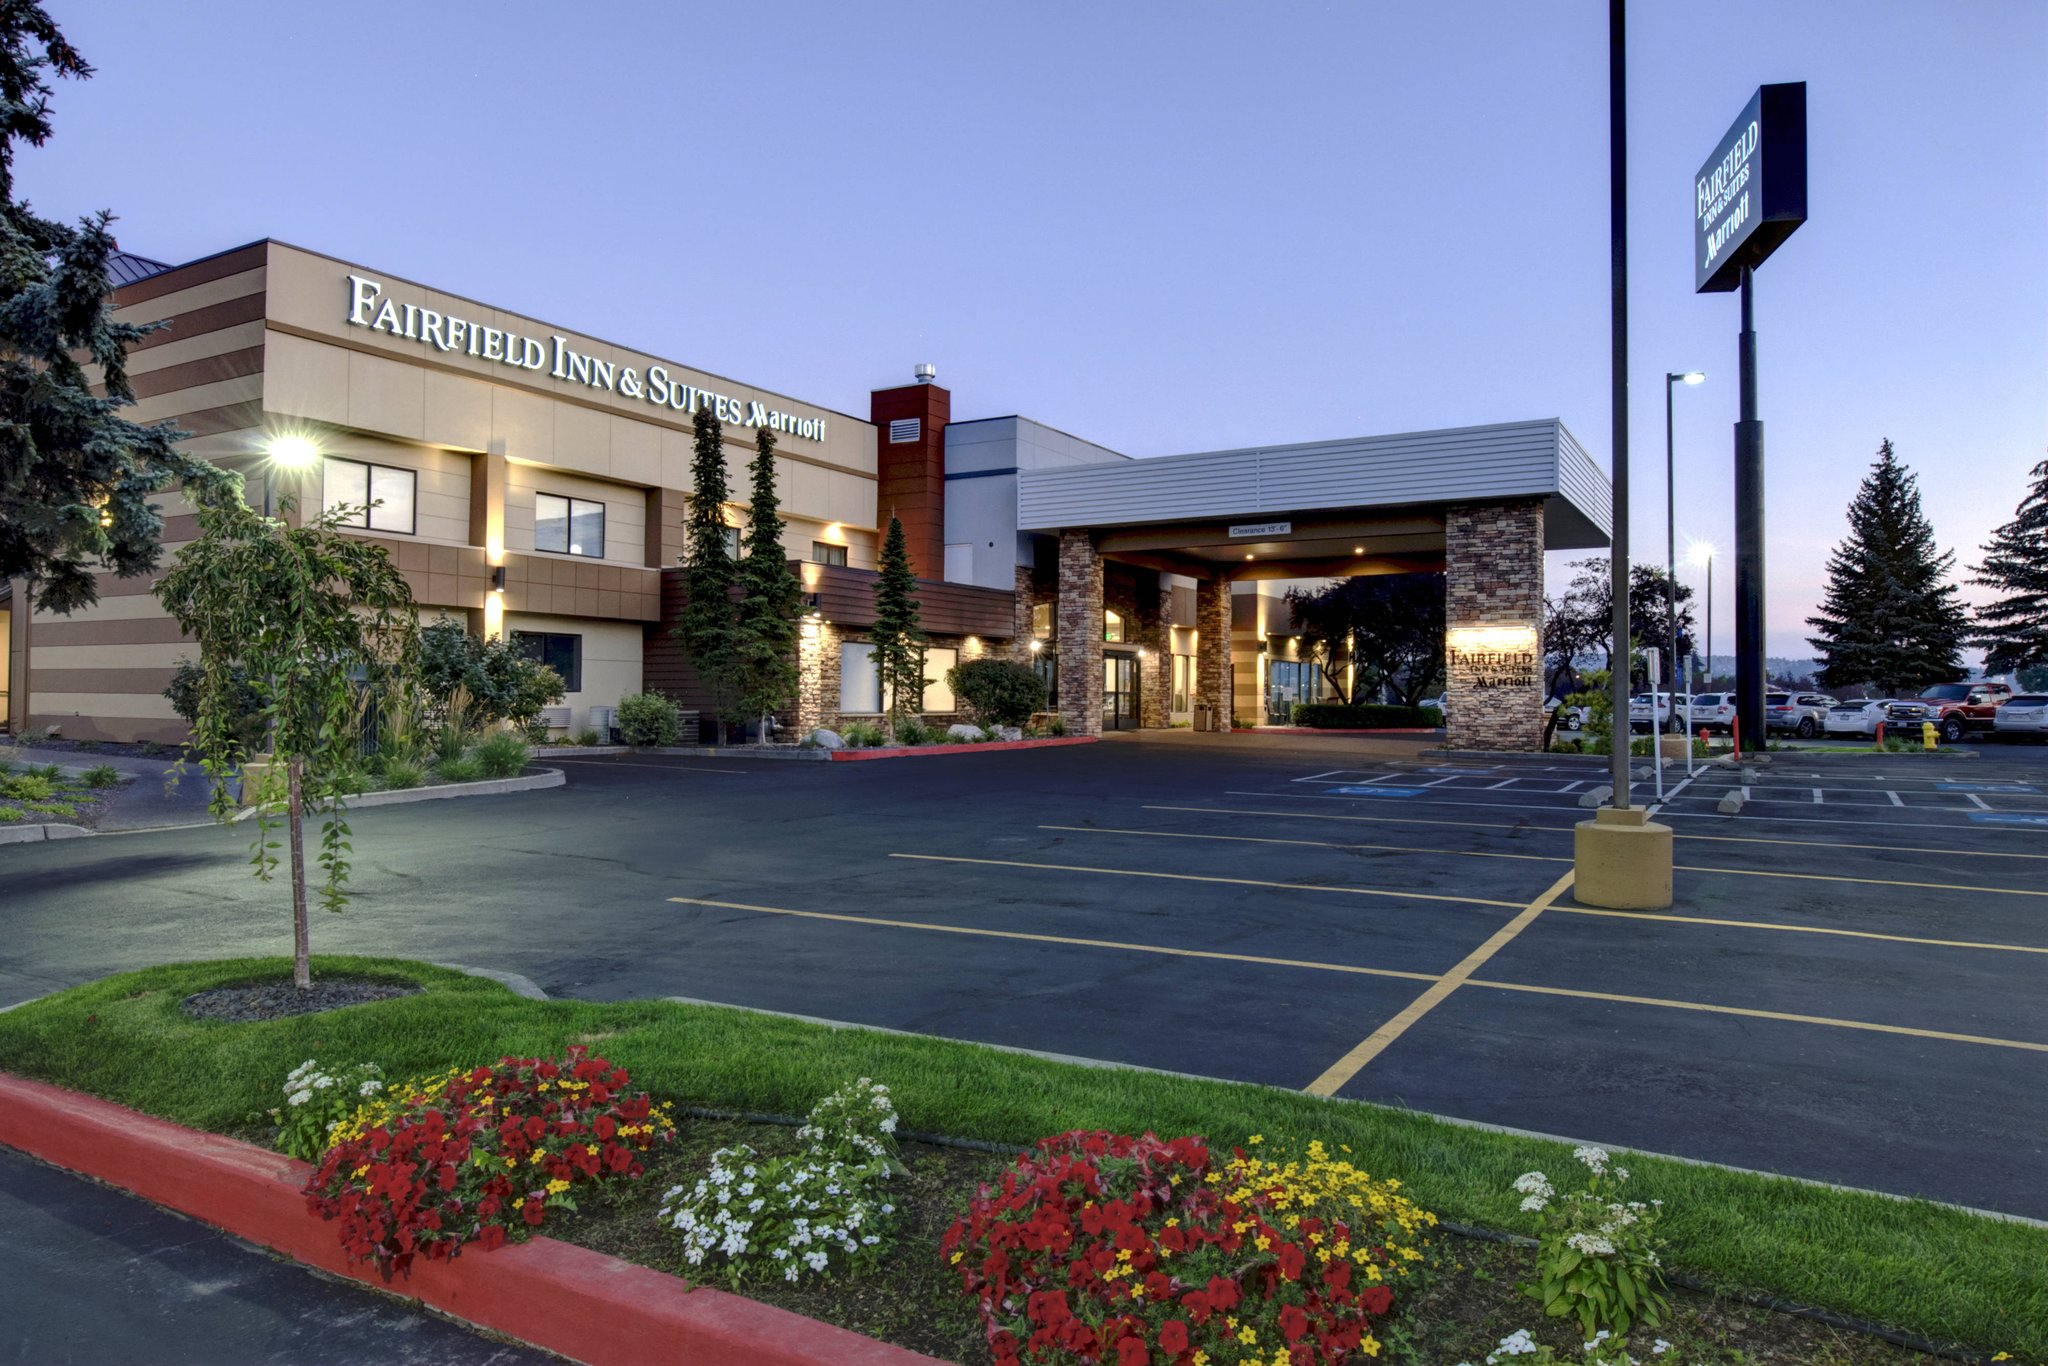 Fairfield Inn and Suites Spokane Valley